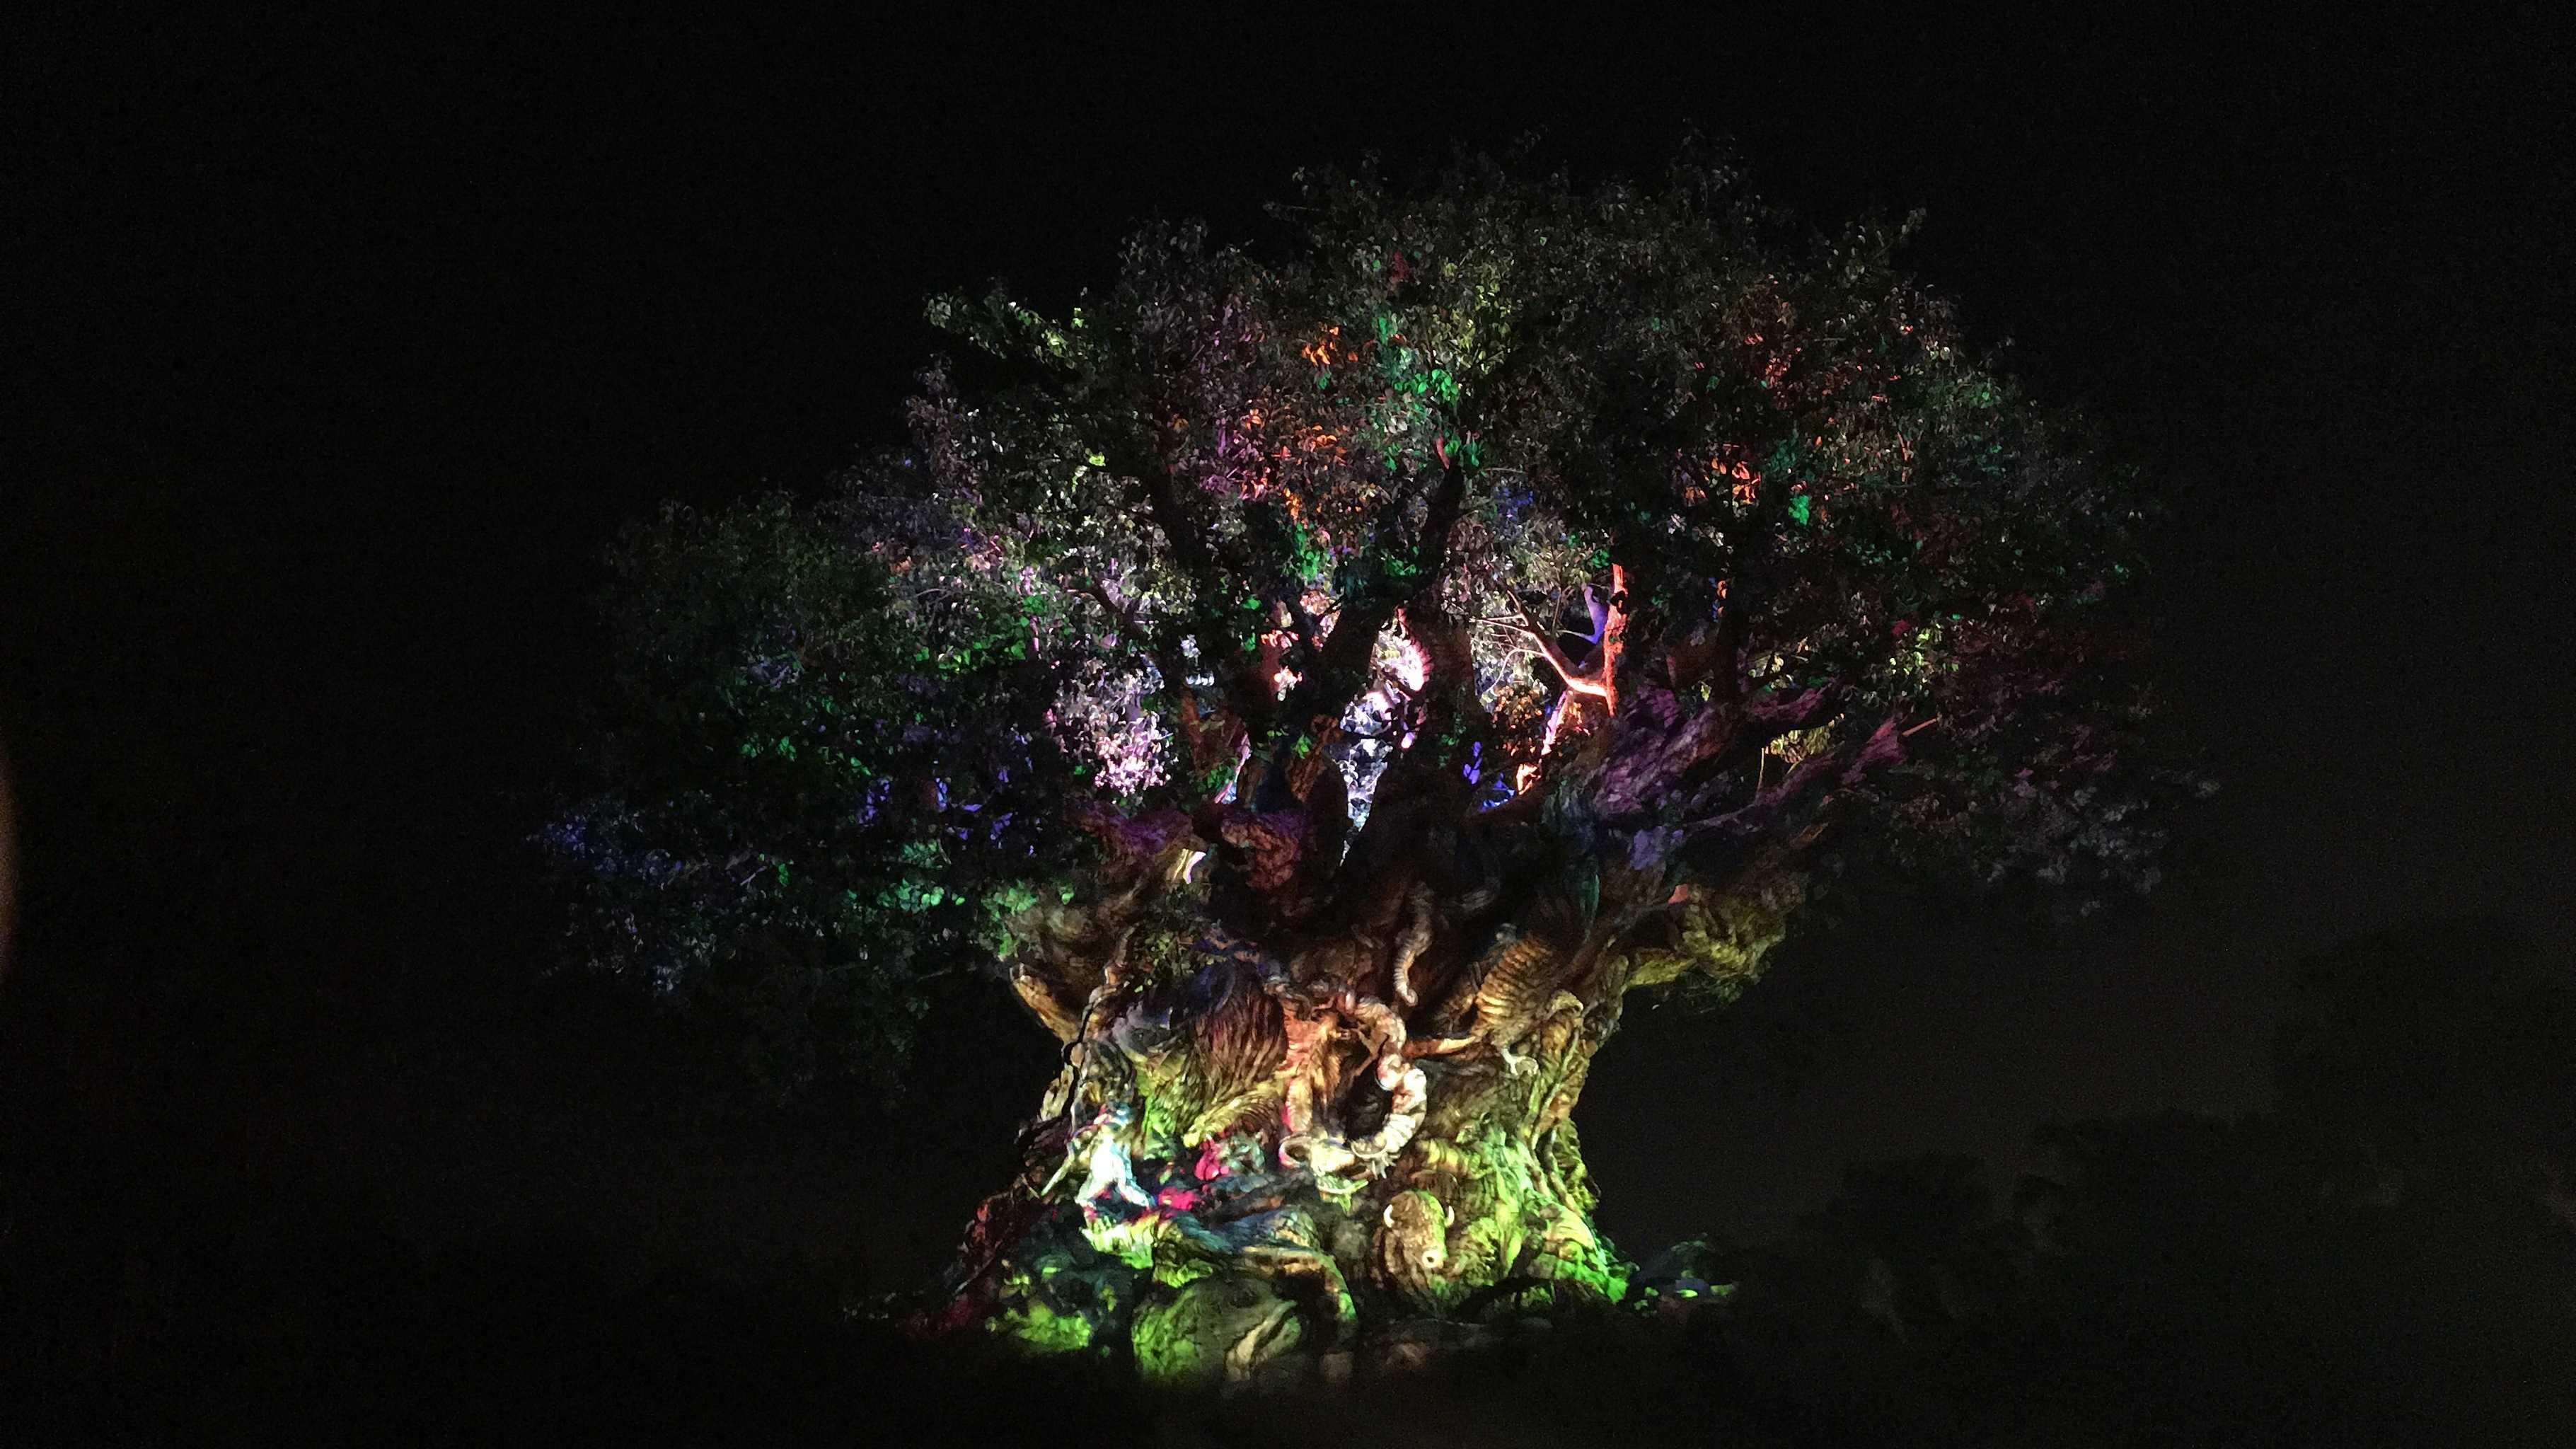 Disney's Animal Kingdom awakens after dark